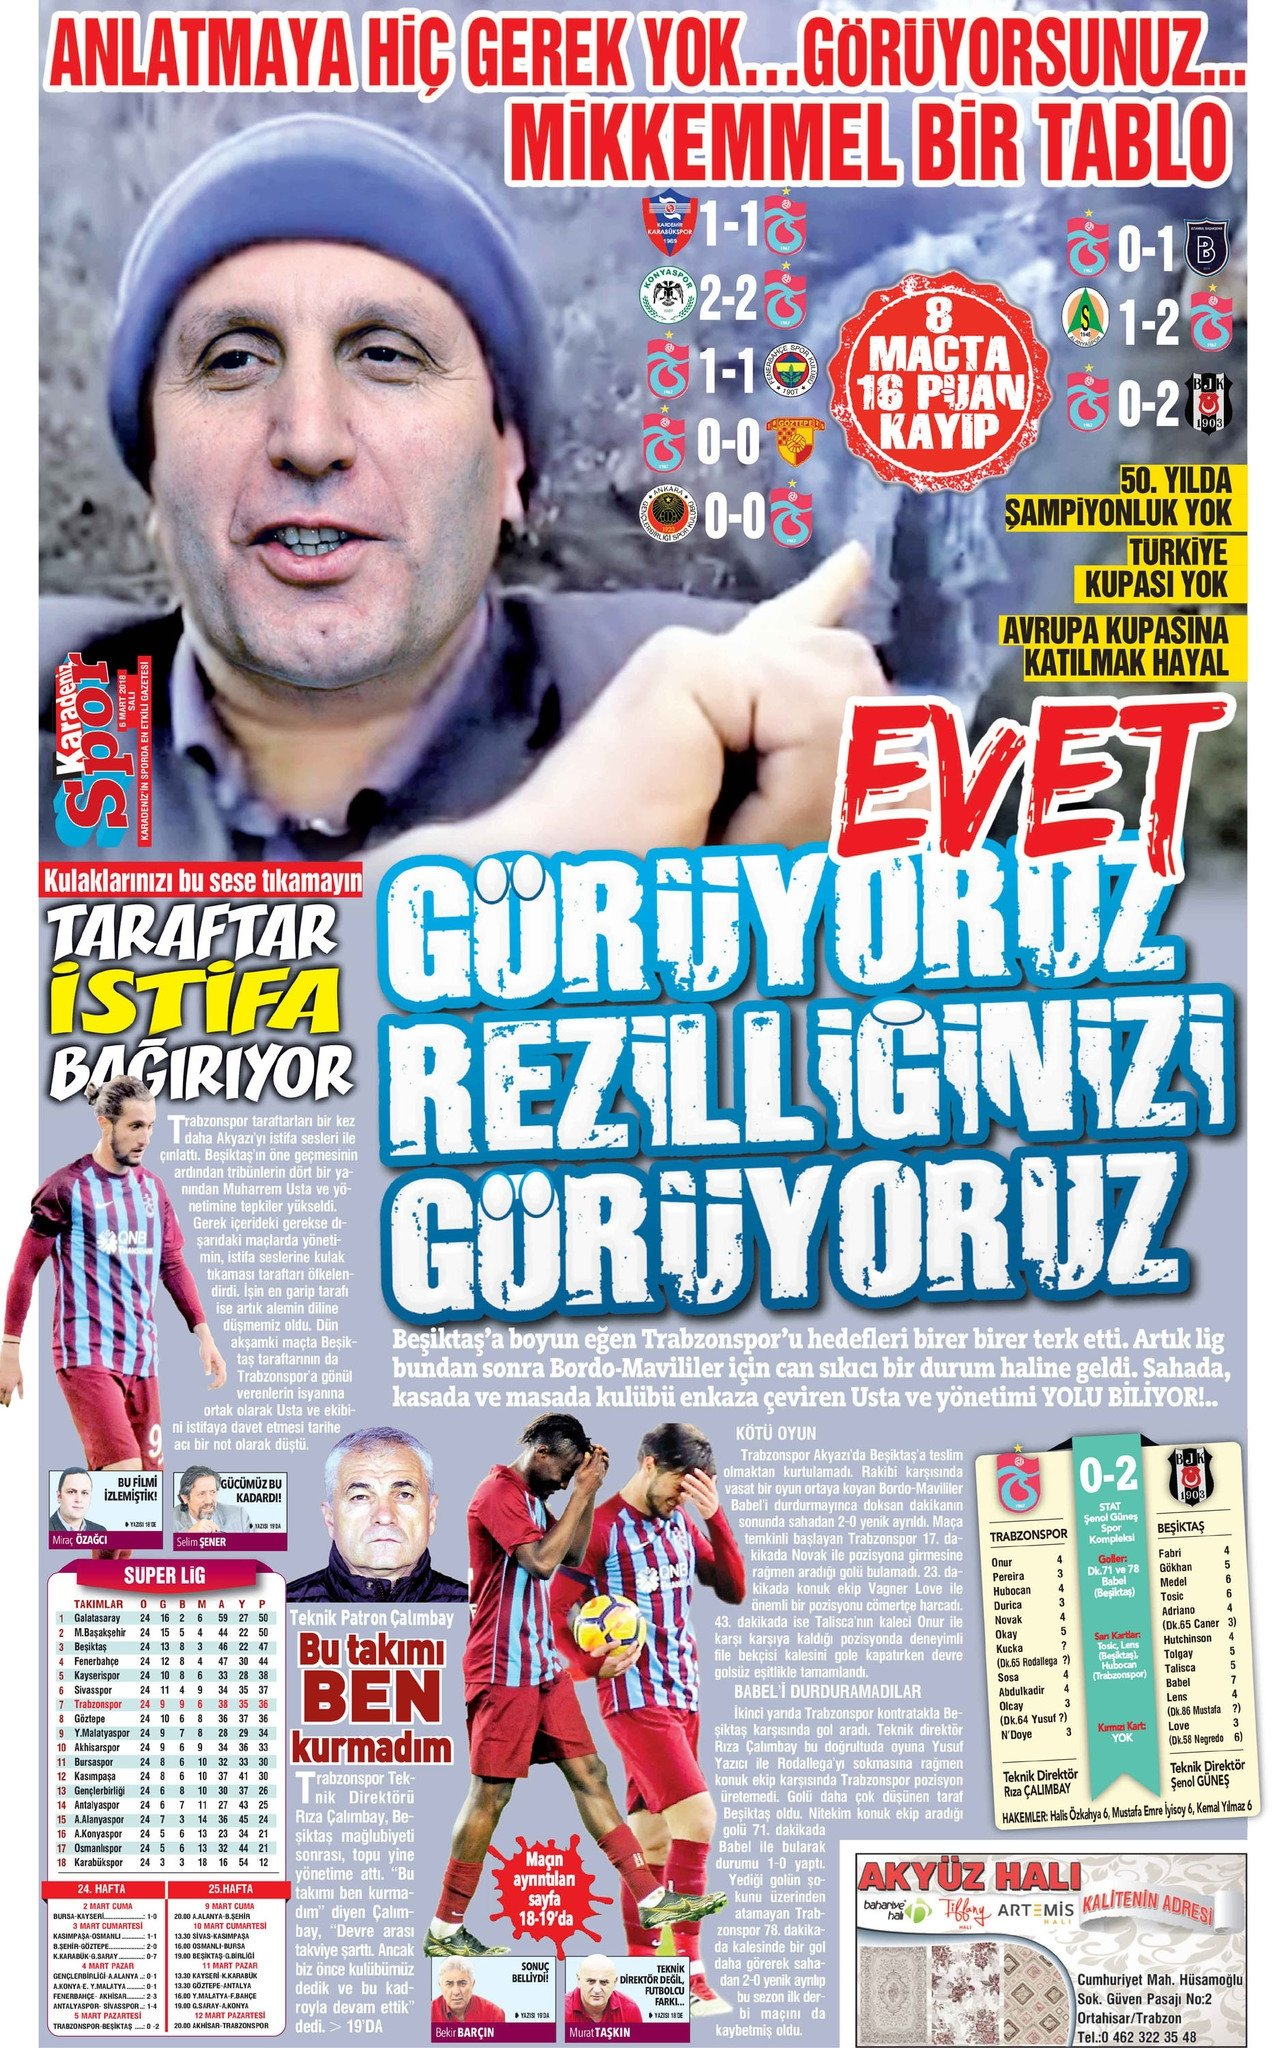 Yerel basından Trabzonspor'a tepki!